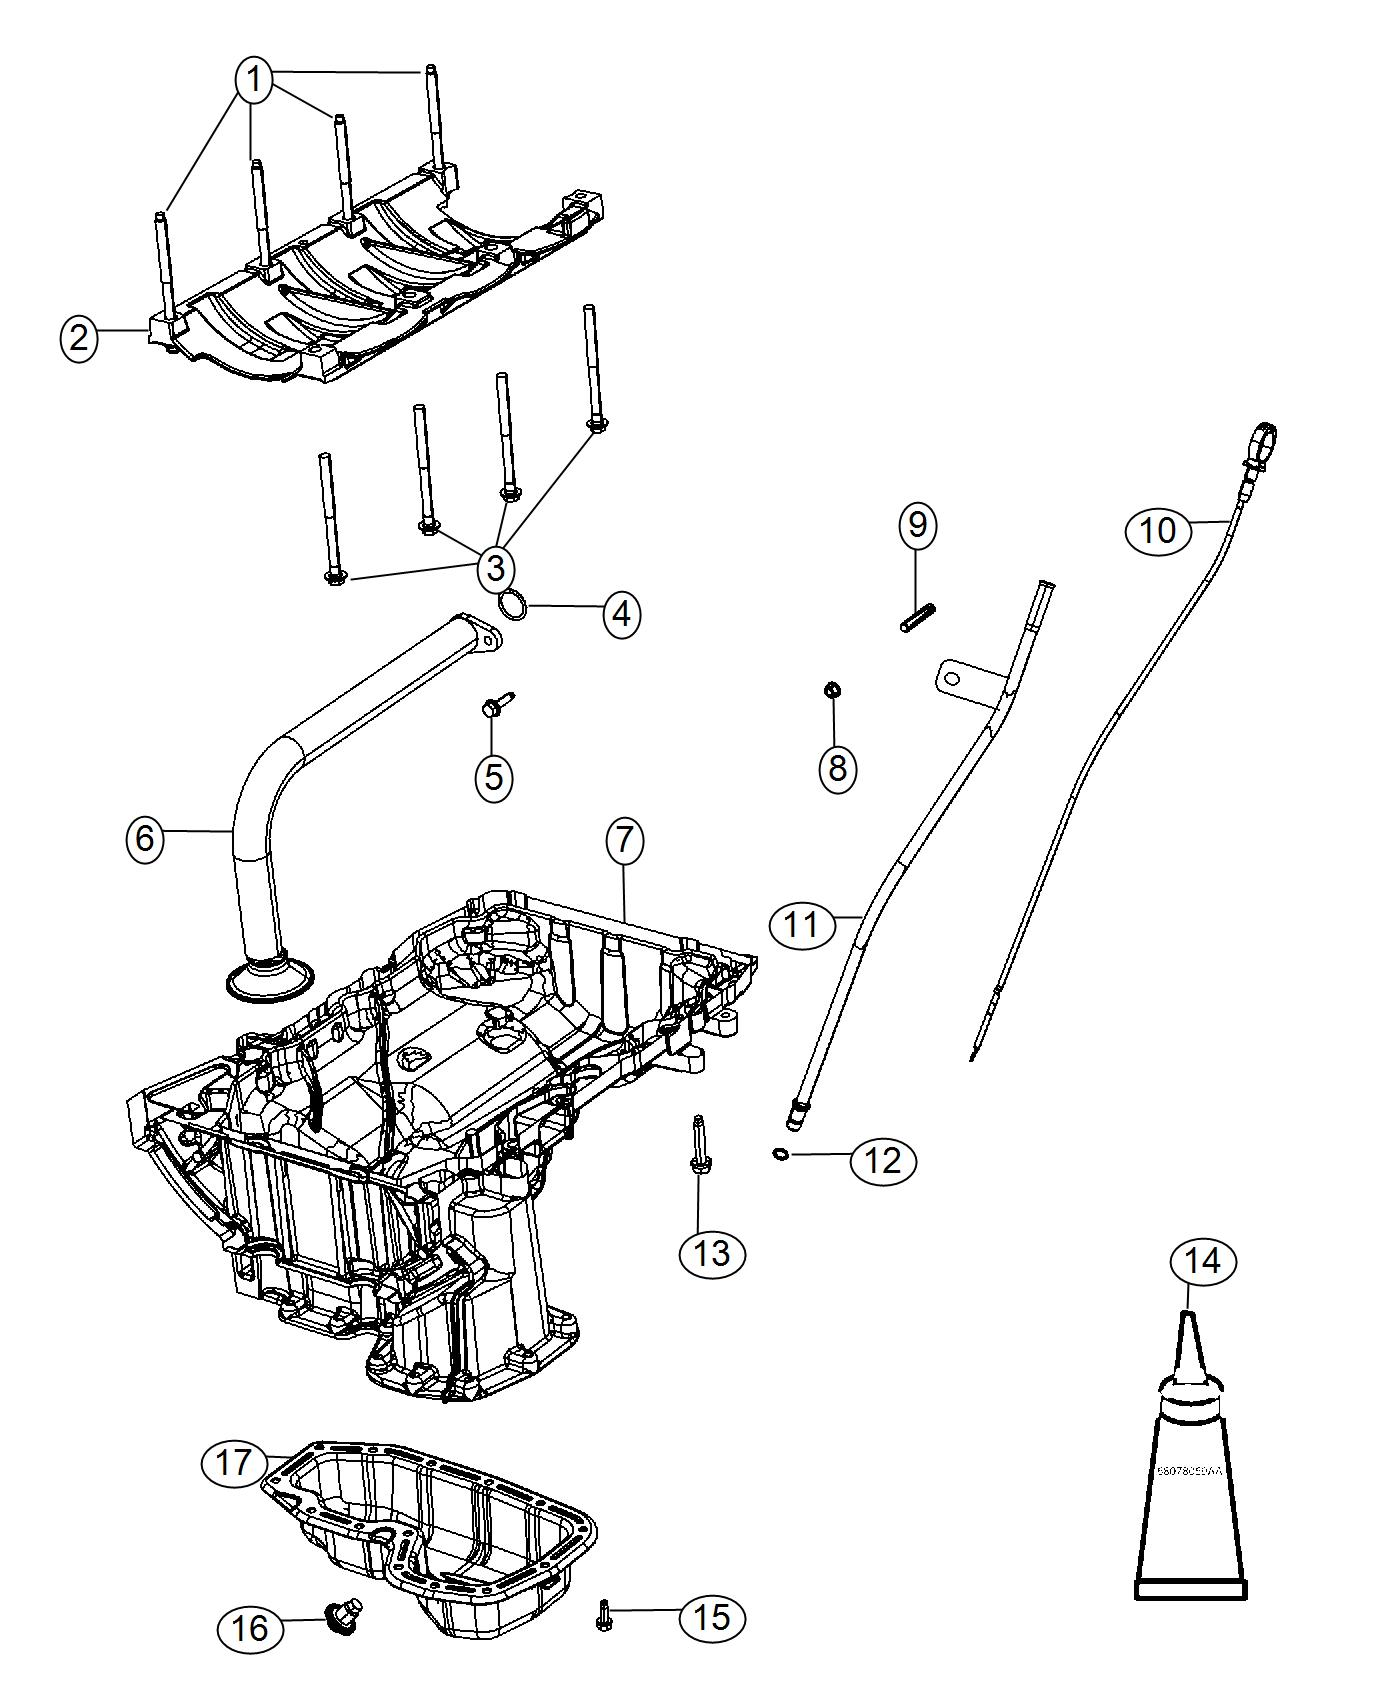 Jeep Grand Cherokee Pan Oil Upper Engine Level